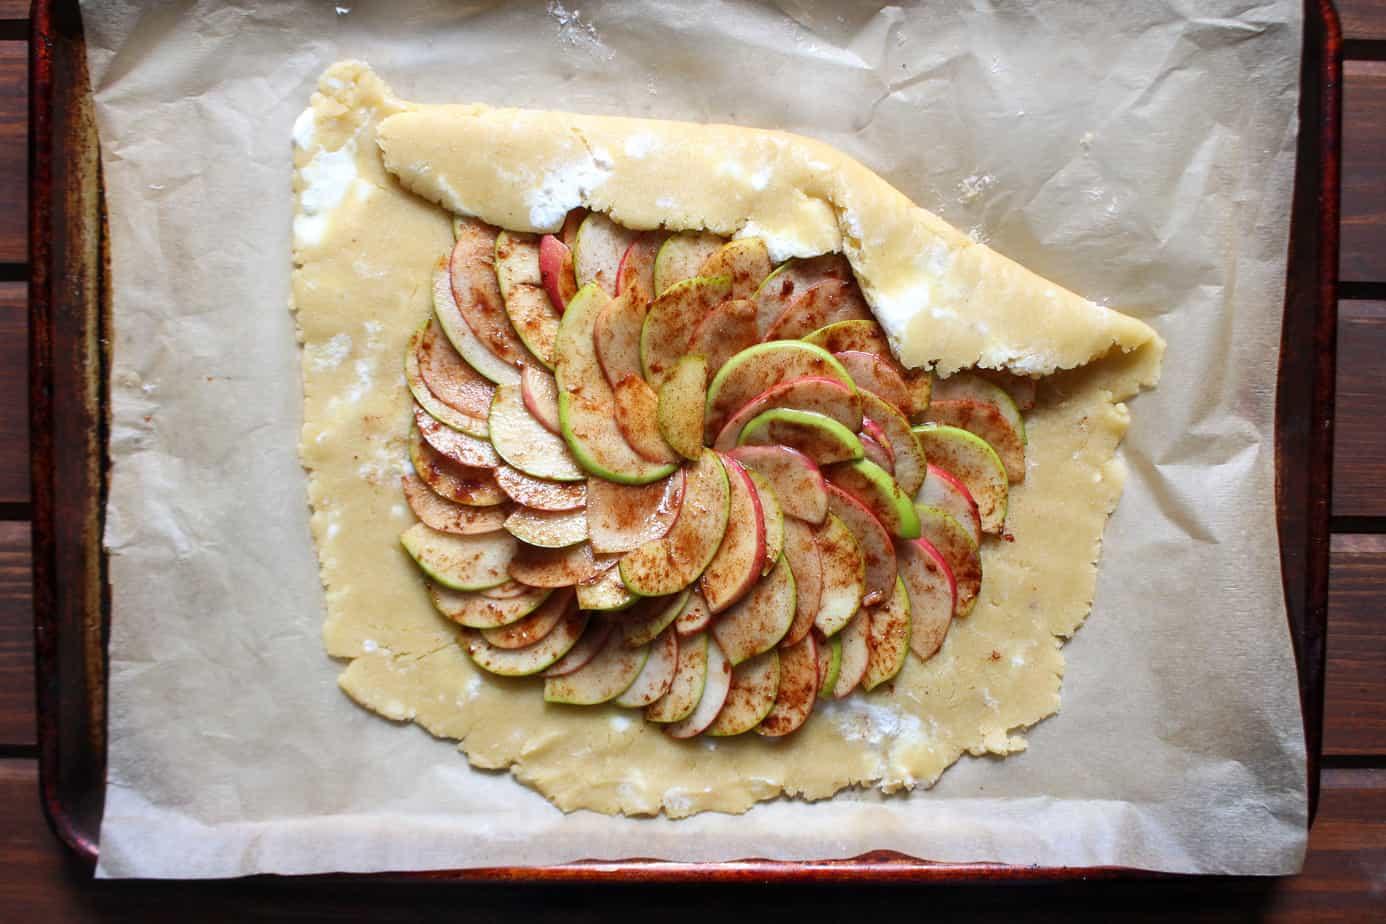 Uncooked cinnamon apple pie galette on sheet pan